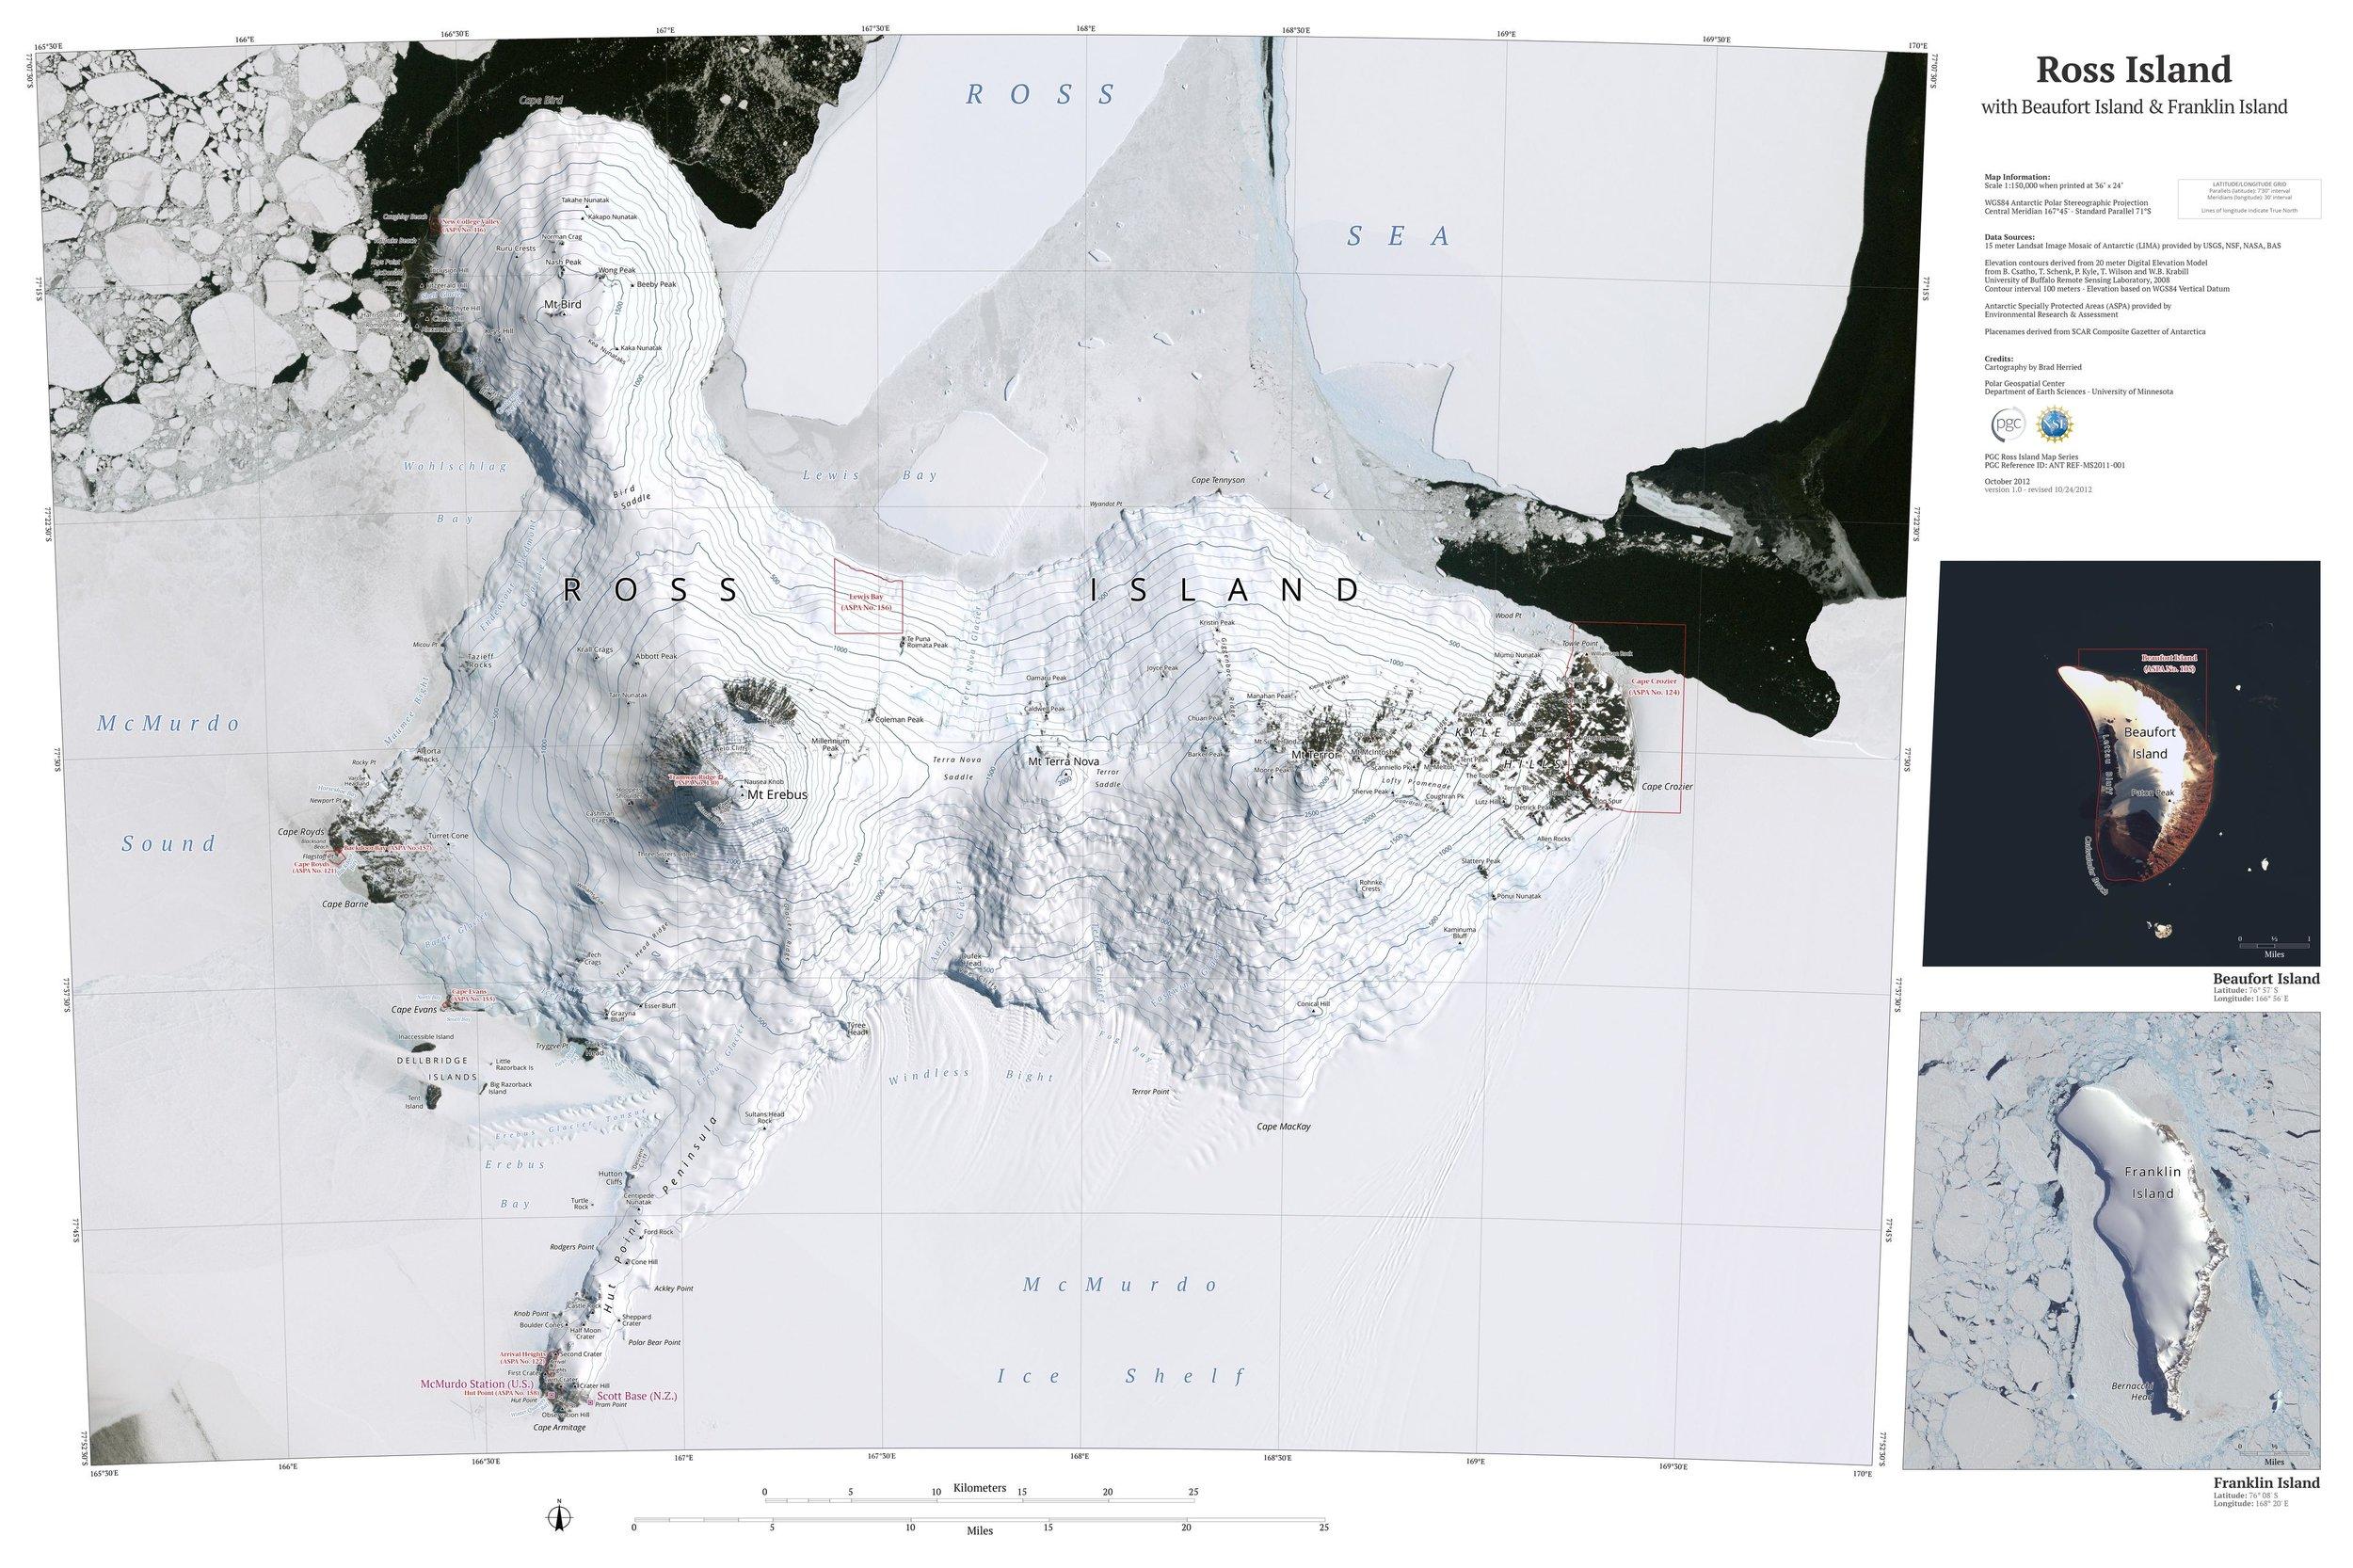 Ross Island and Beaufort Island & Franklin Island, by Brad Herried, Polar Geospatial Center